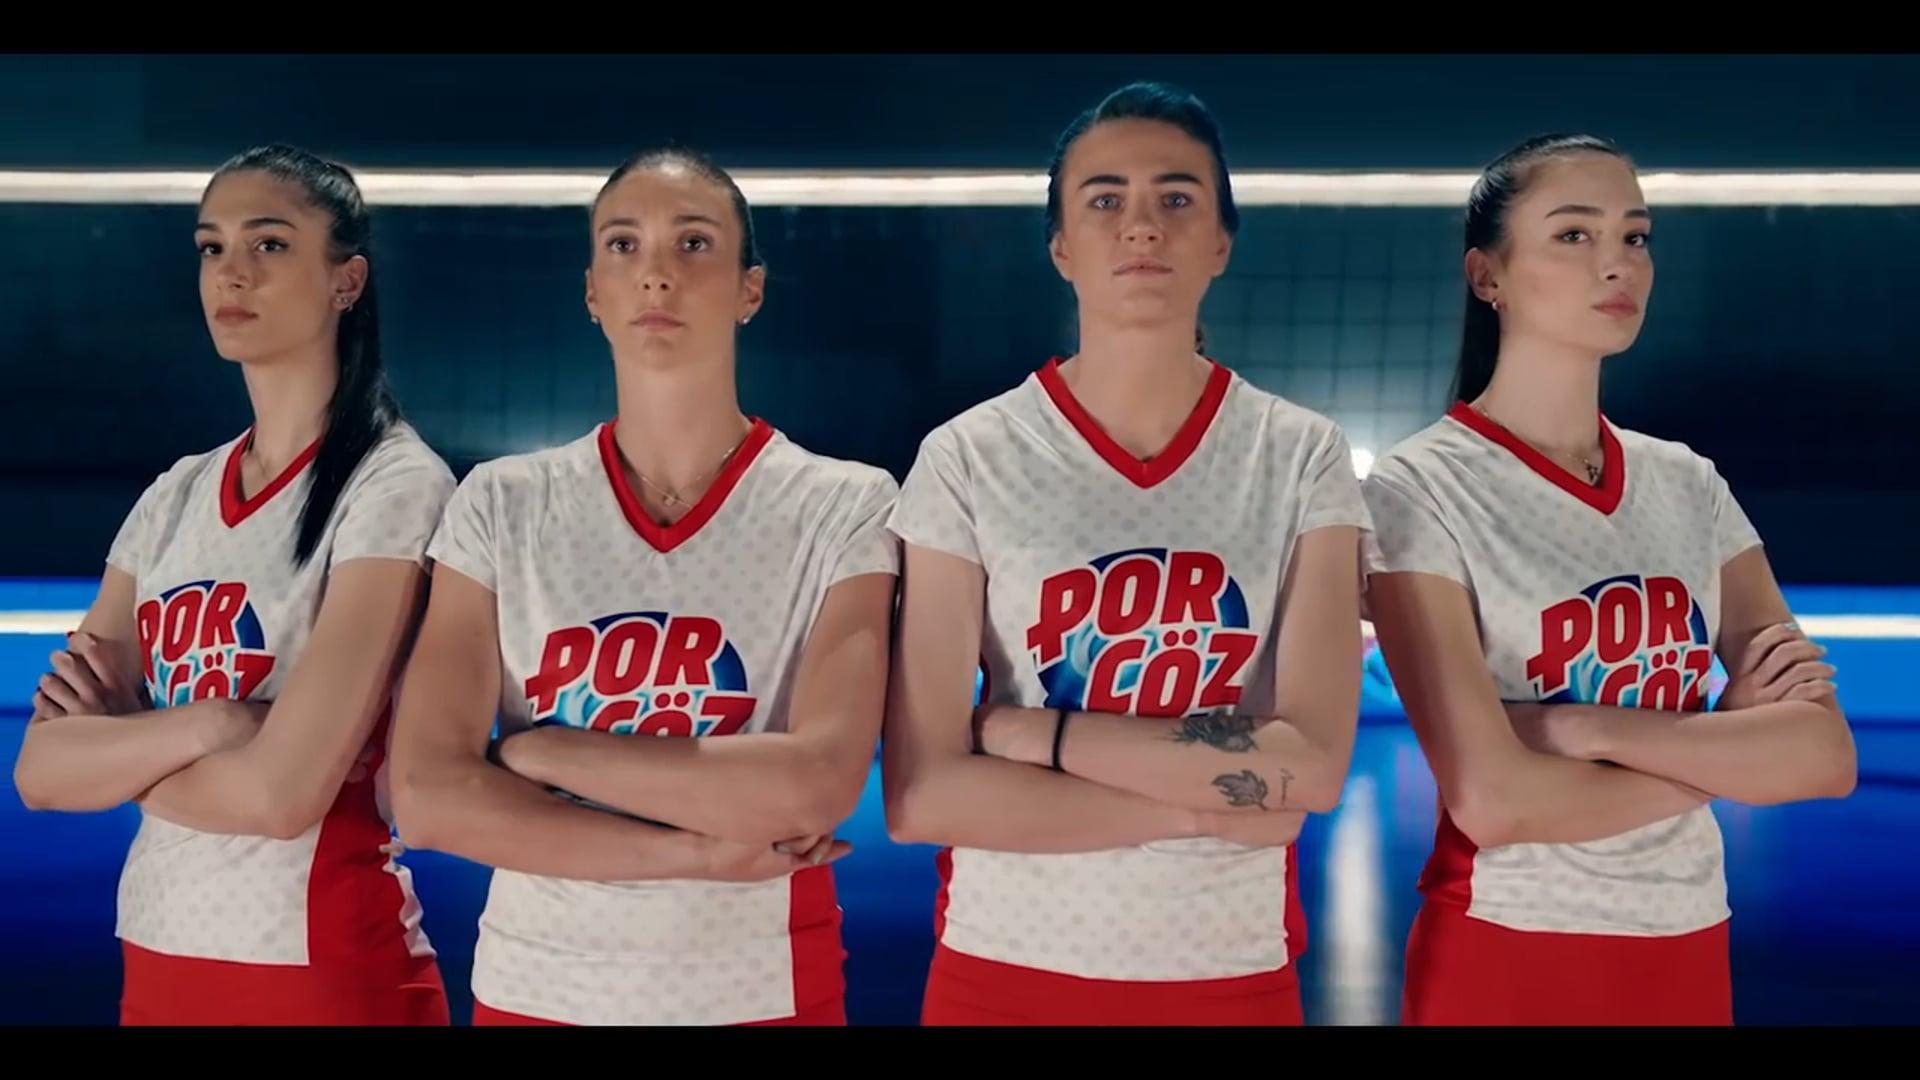 Porçöz - Kadın Voleybol Milli Takımı Ana Sponsörü